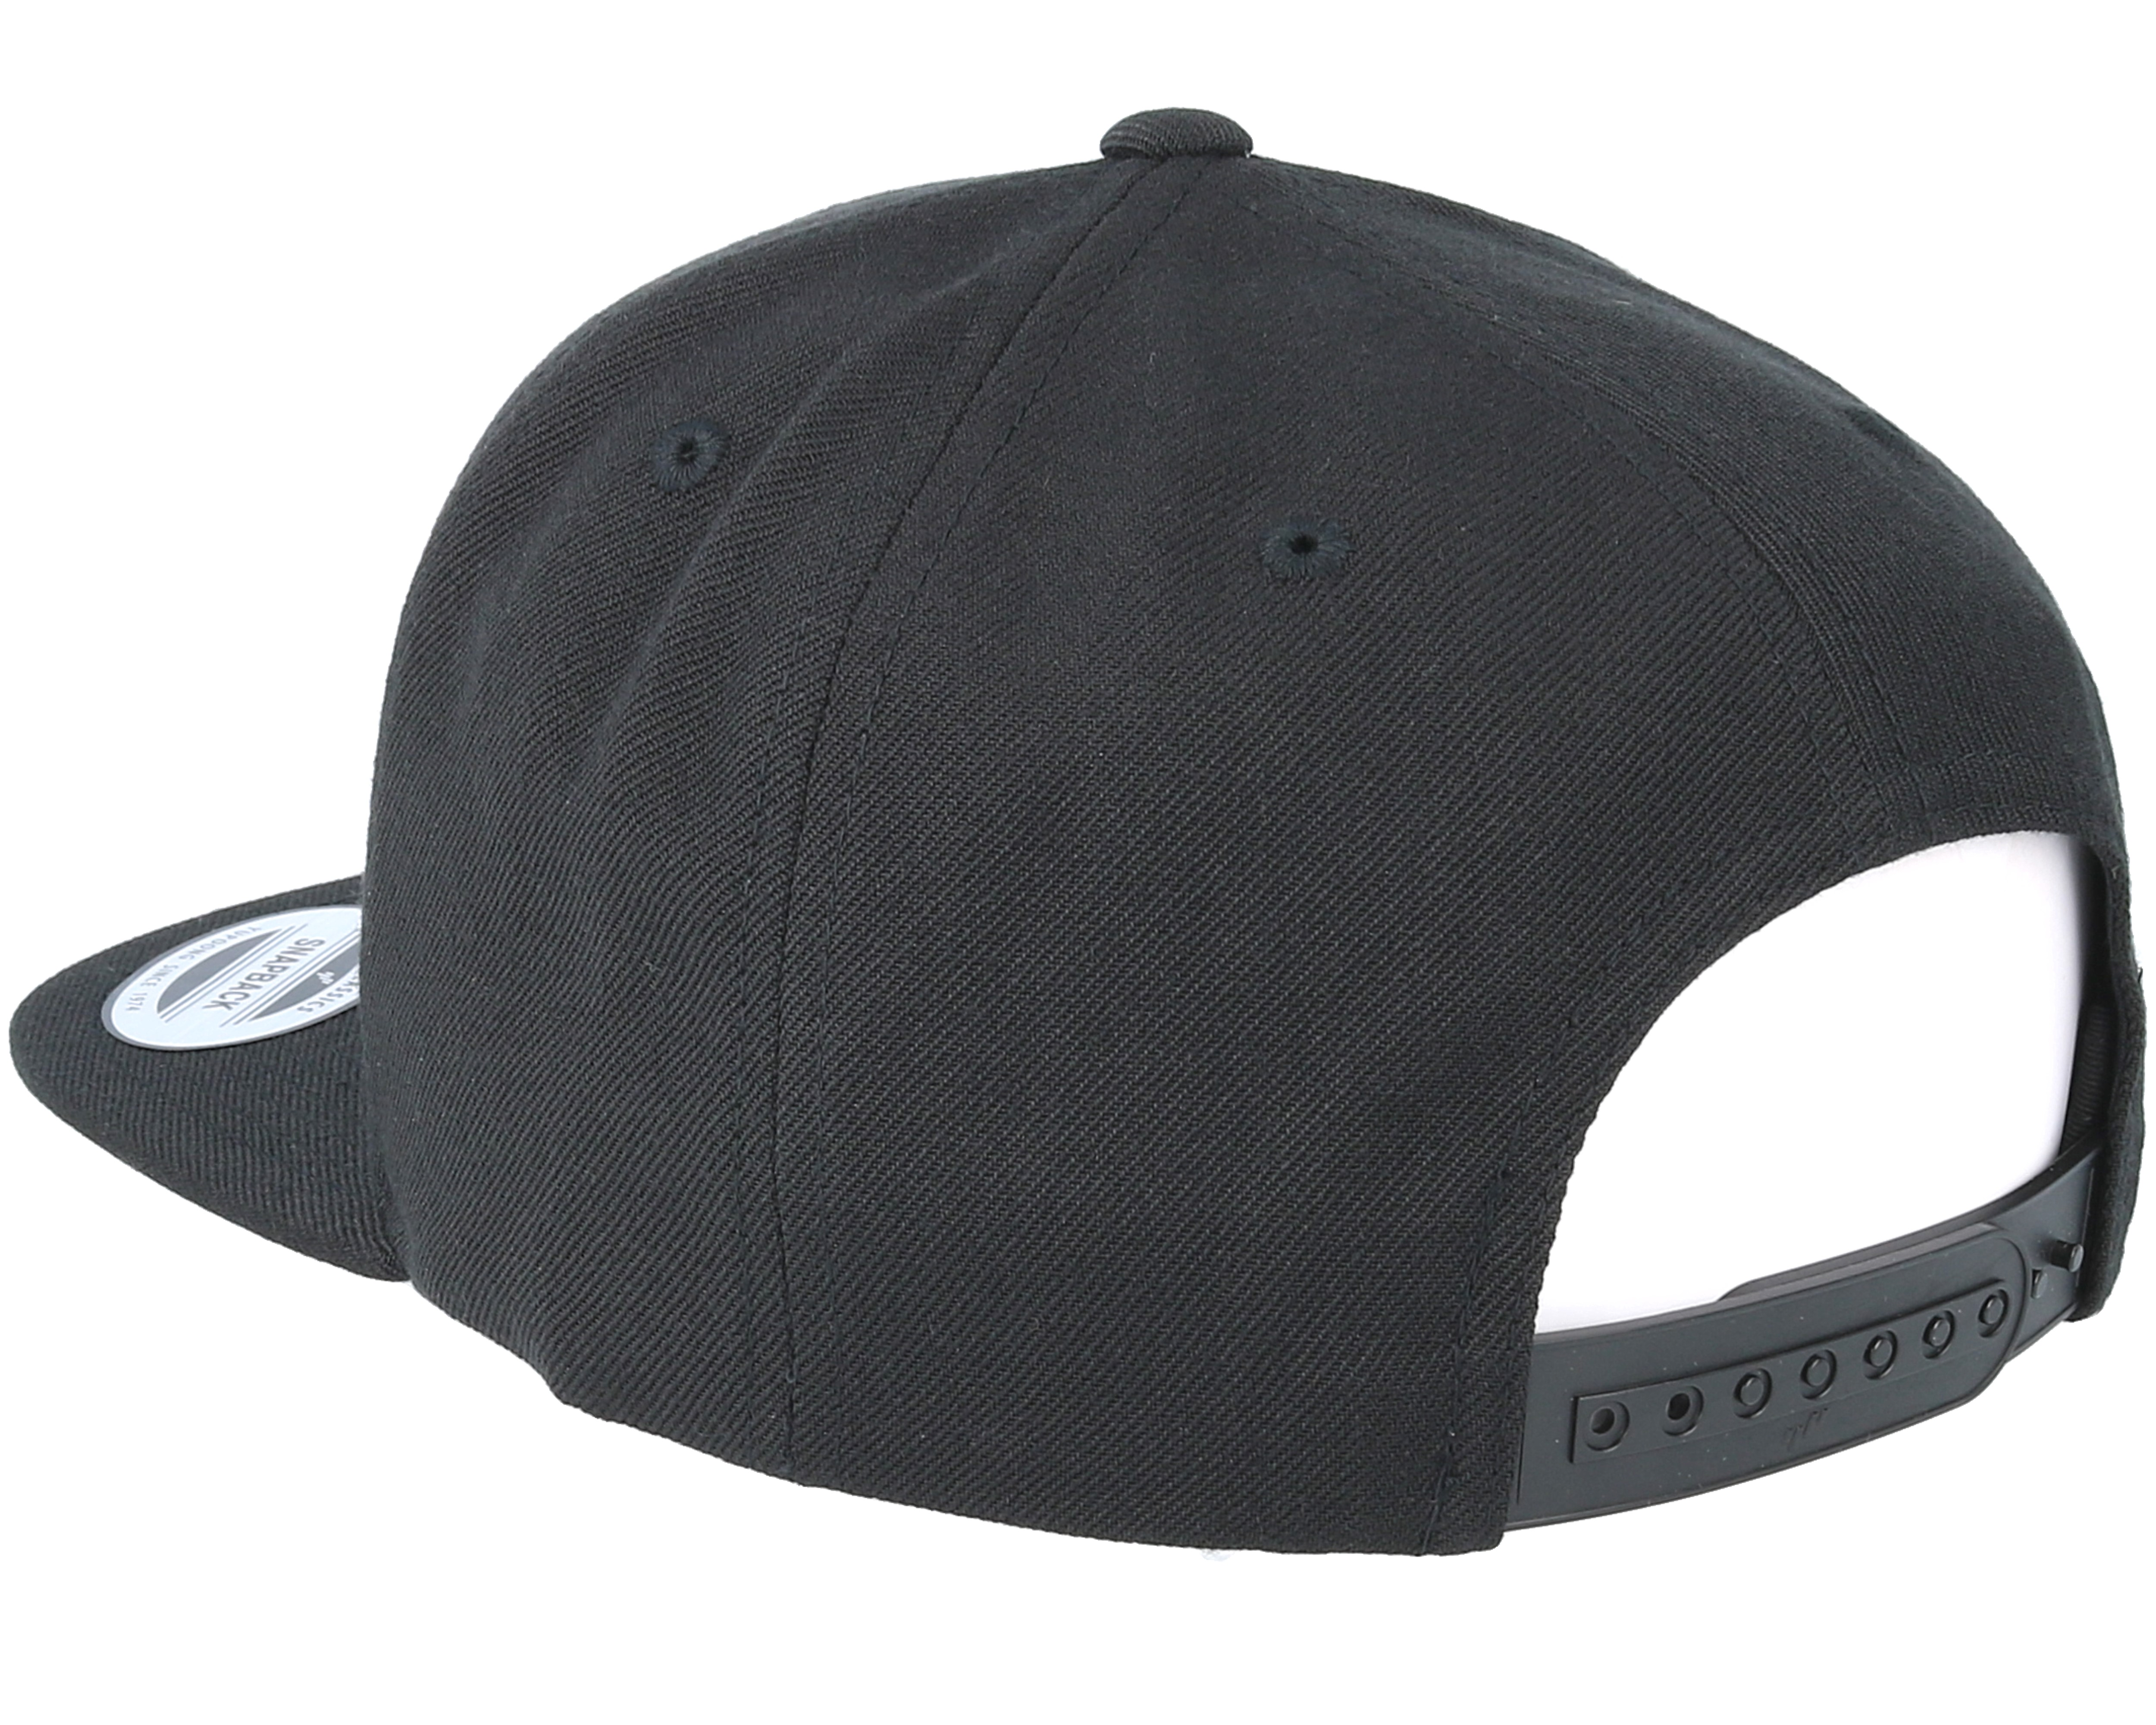 shades of nature black snapback wild spirit cap. Black Bedroom Furniture Sets. Home Design Ideas